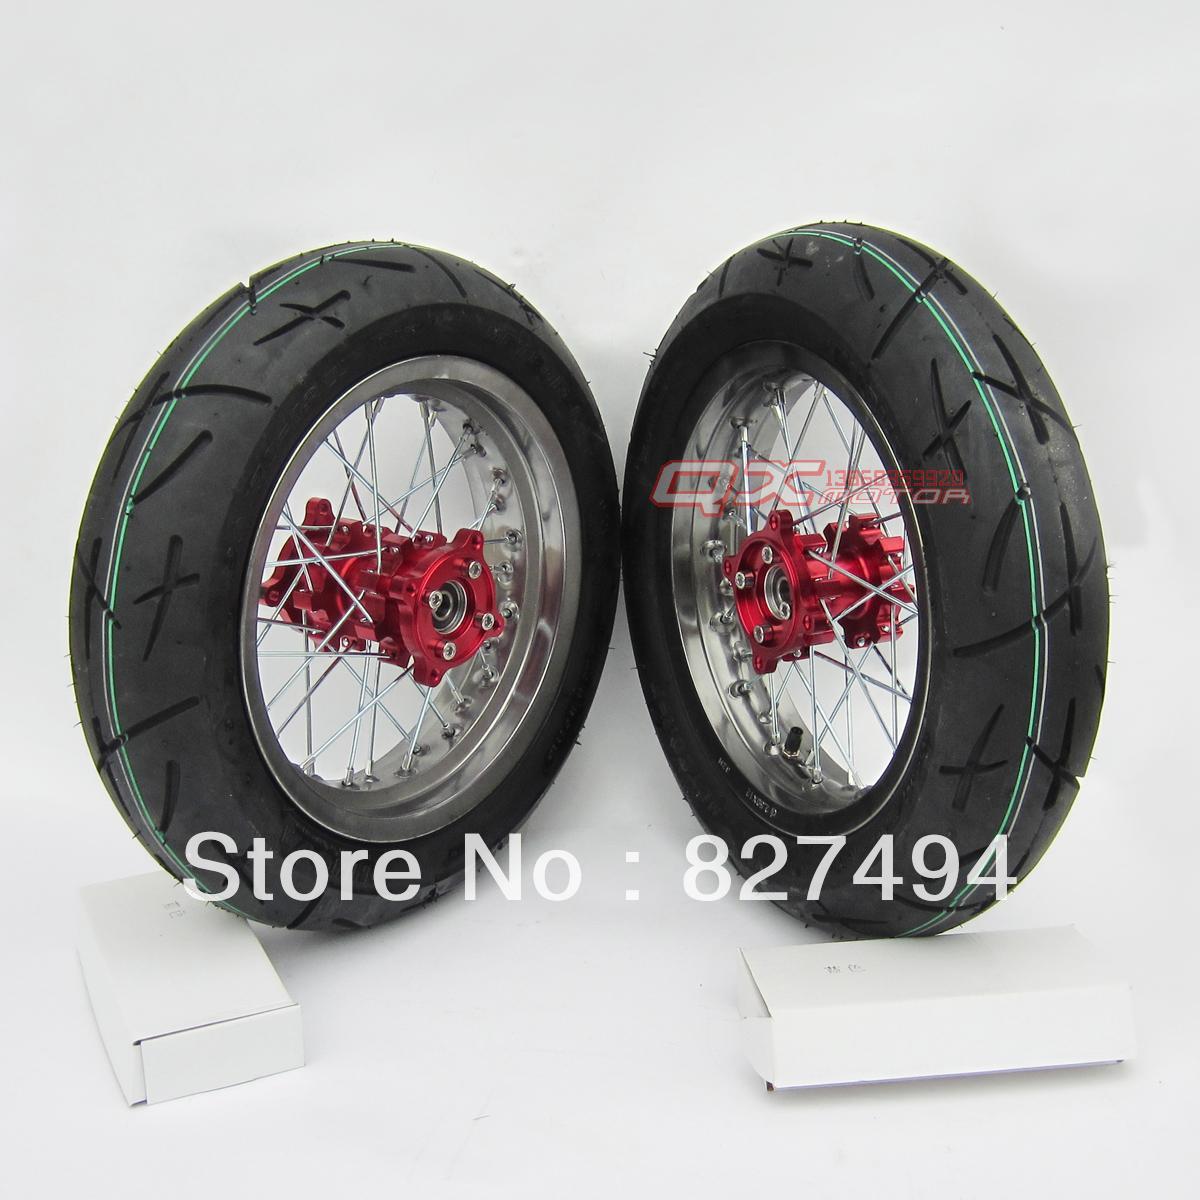 Off-road motorcycle refit 12 cnc rim heat wheel assembly(China (Mainland))